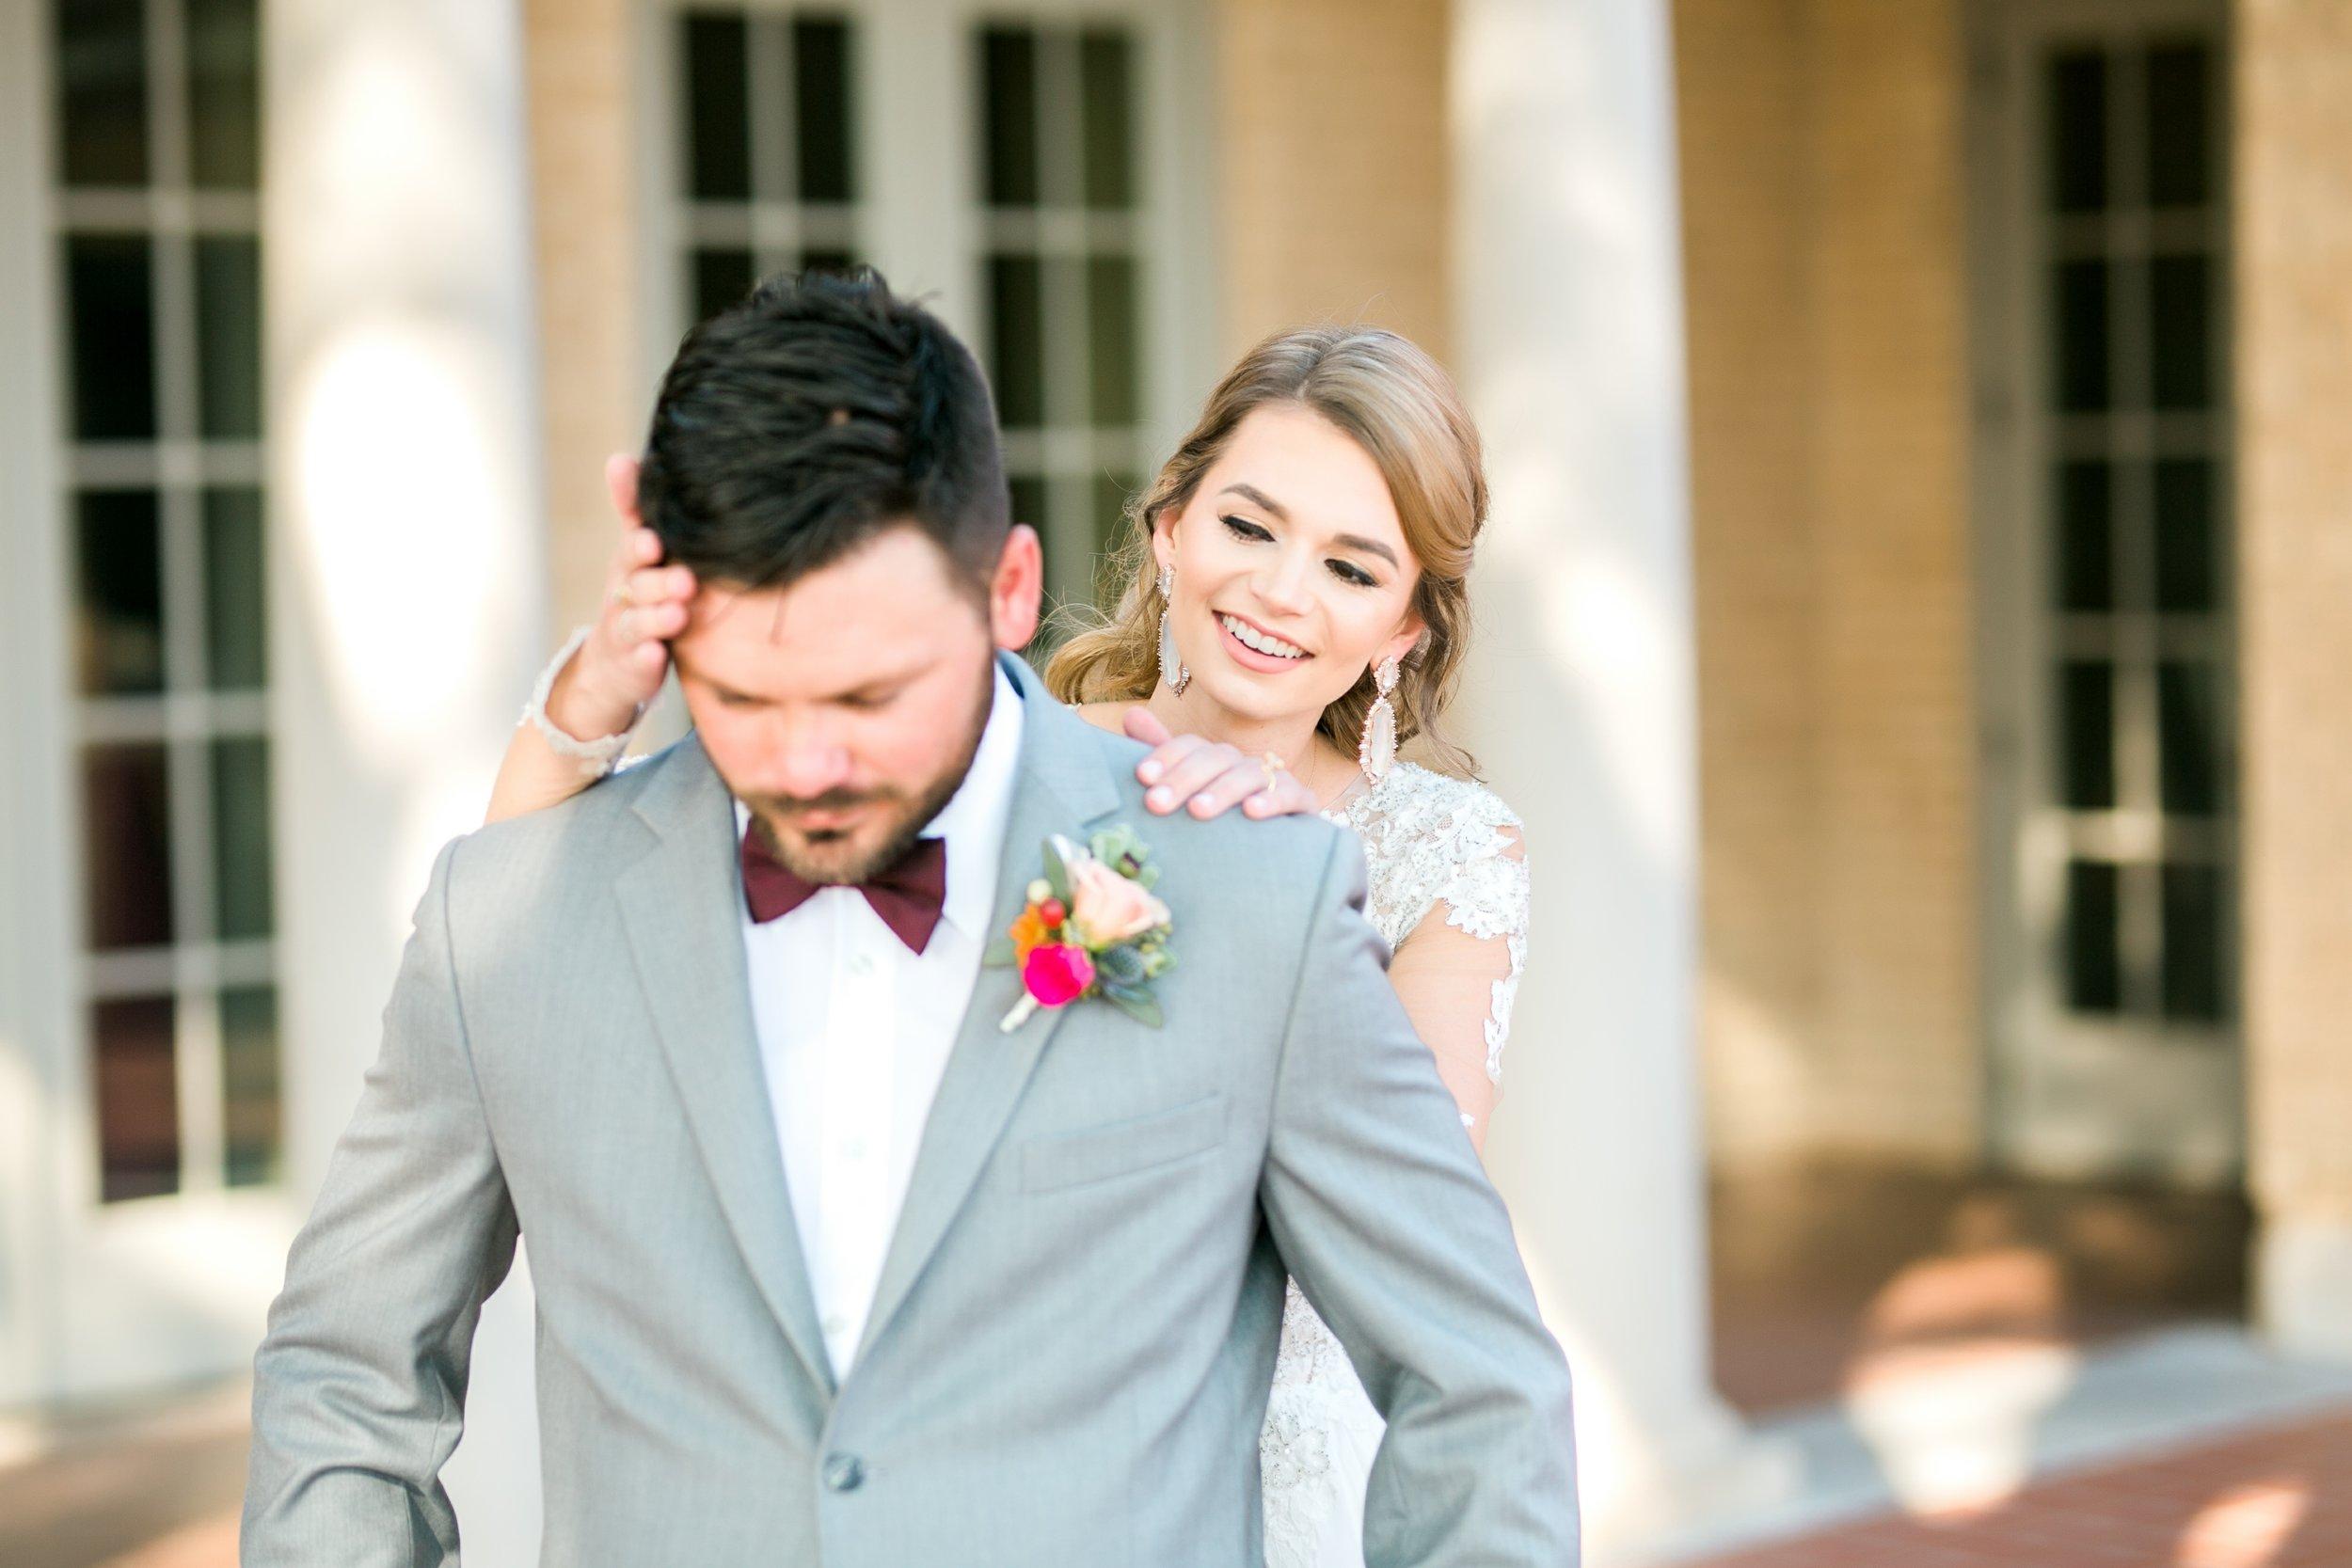 Roberson-Wedding-The-Forum-Lauren-Pinson-Wedding-Photography-Wichita-Falls-Texas-026.jpg